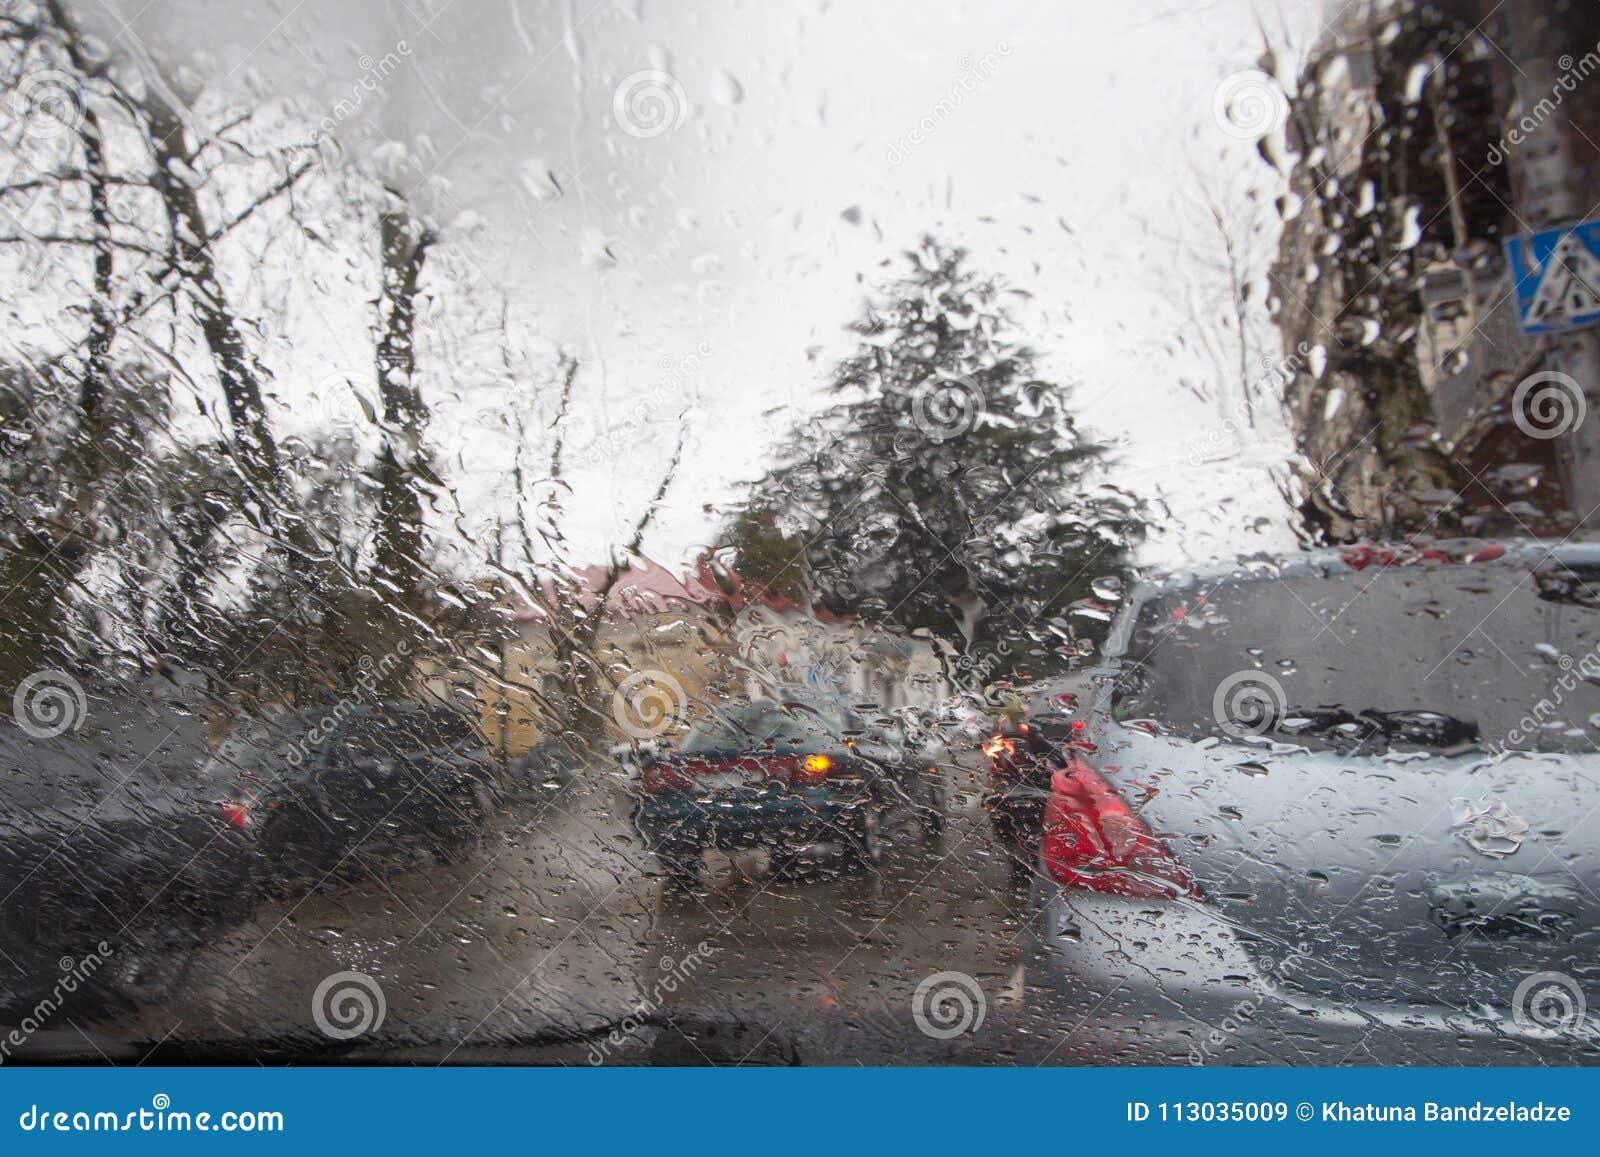 Imagen enfocada del De de la lluvia que baja en el camino, mirando hacia fuera la ventana Silueta borrosa del coche